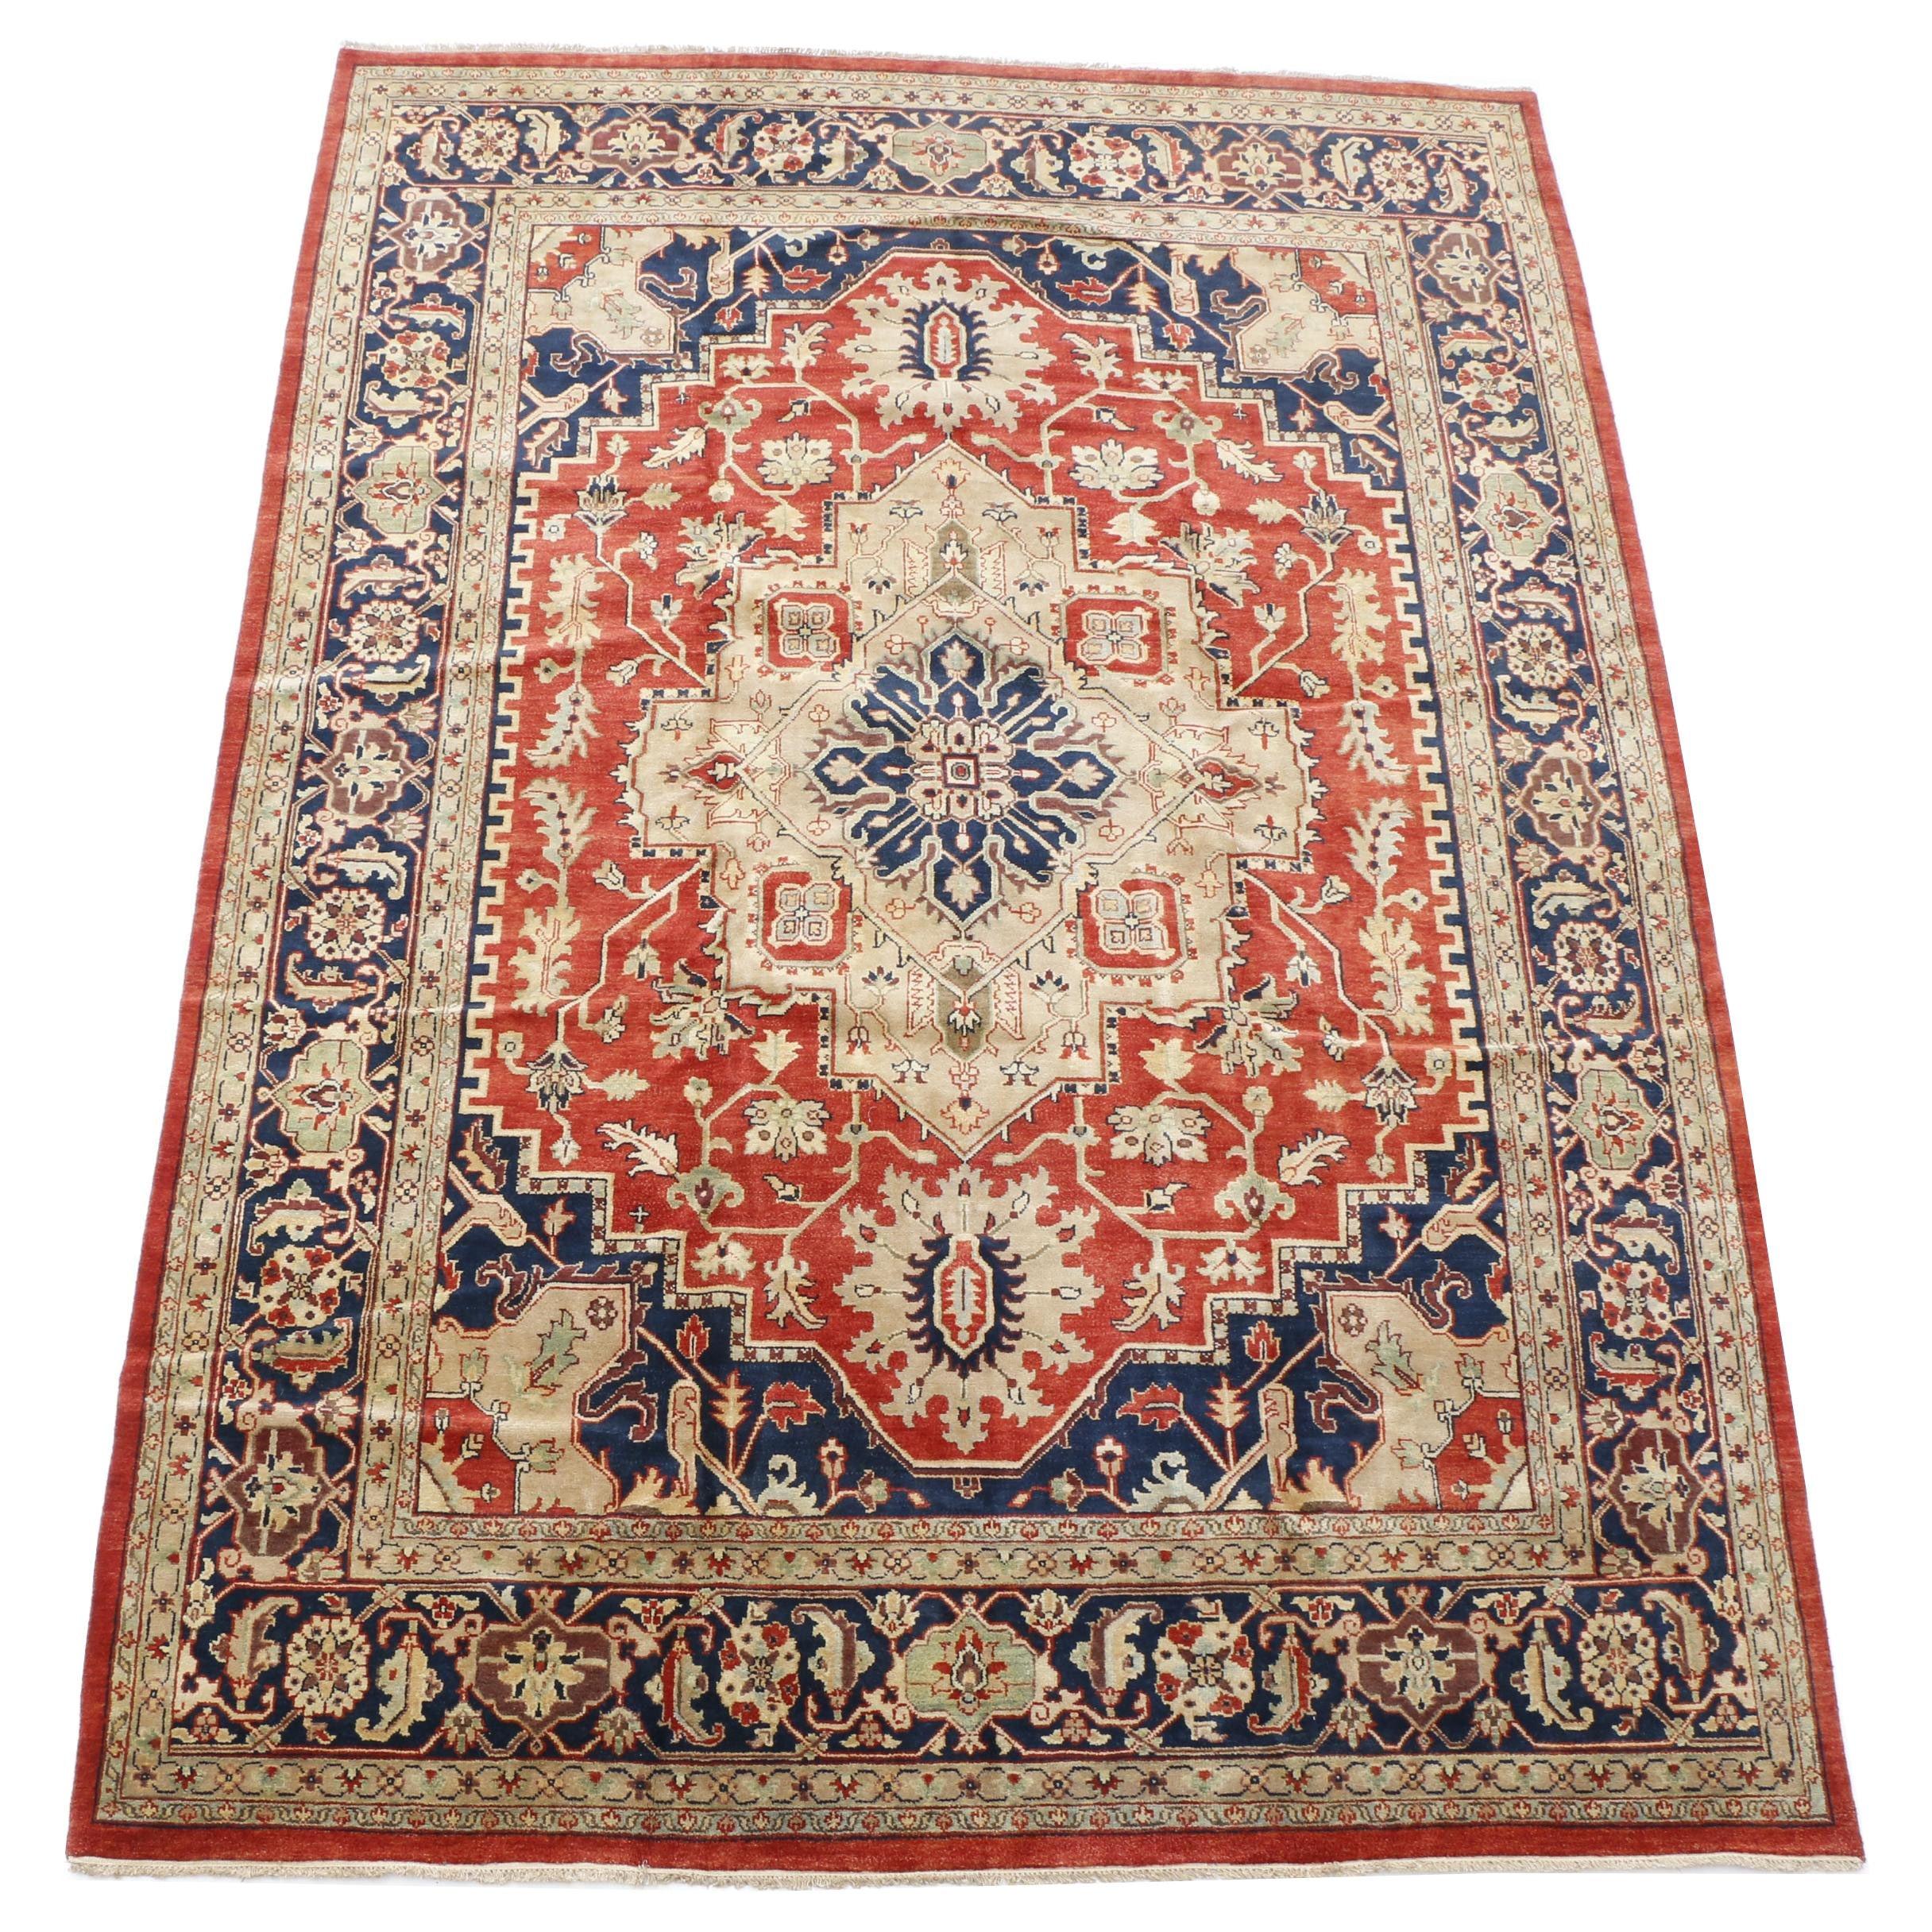 Hand-Knotted Bakshayesh Heriz Wool Room Sized Rug